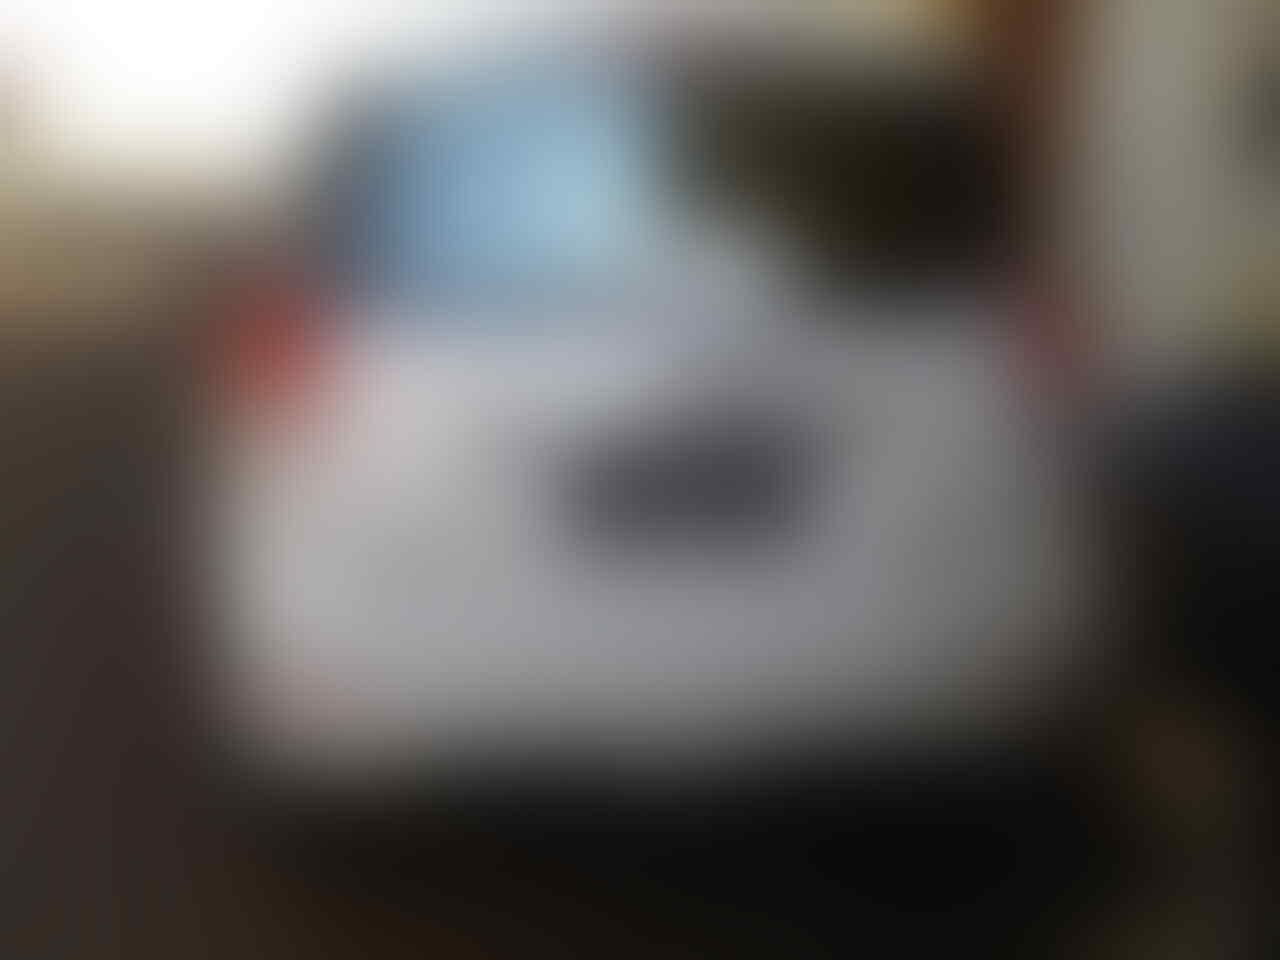 S3RIOUS - Suzuki Ertiga on Kaskus - Part 6